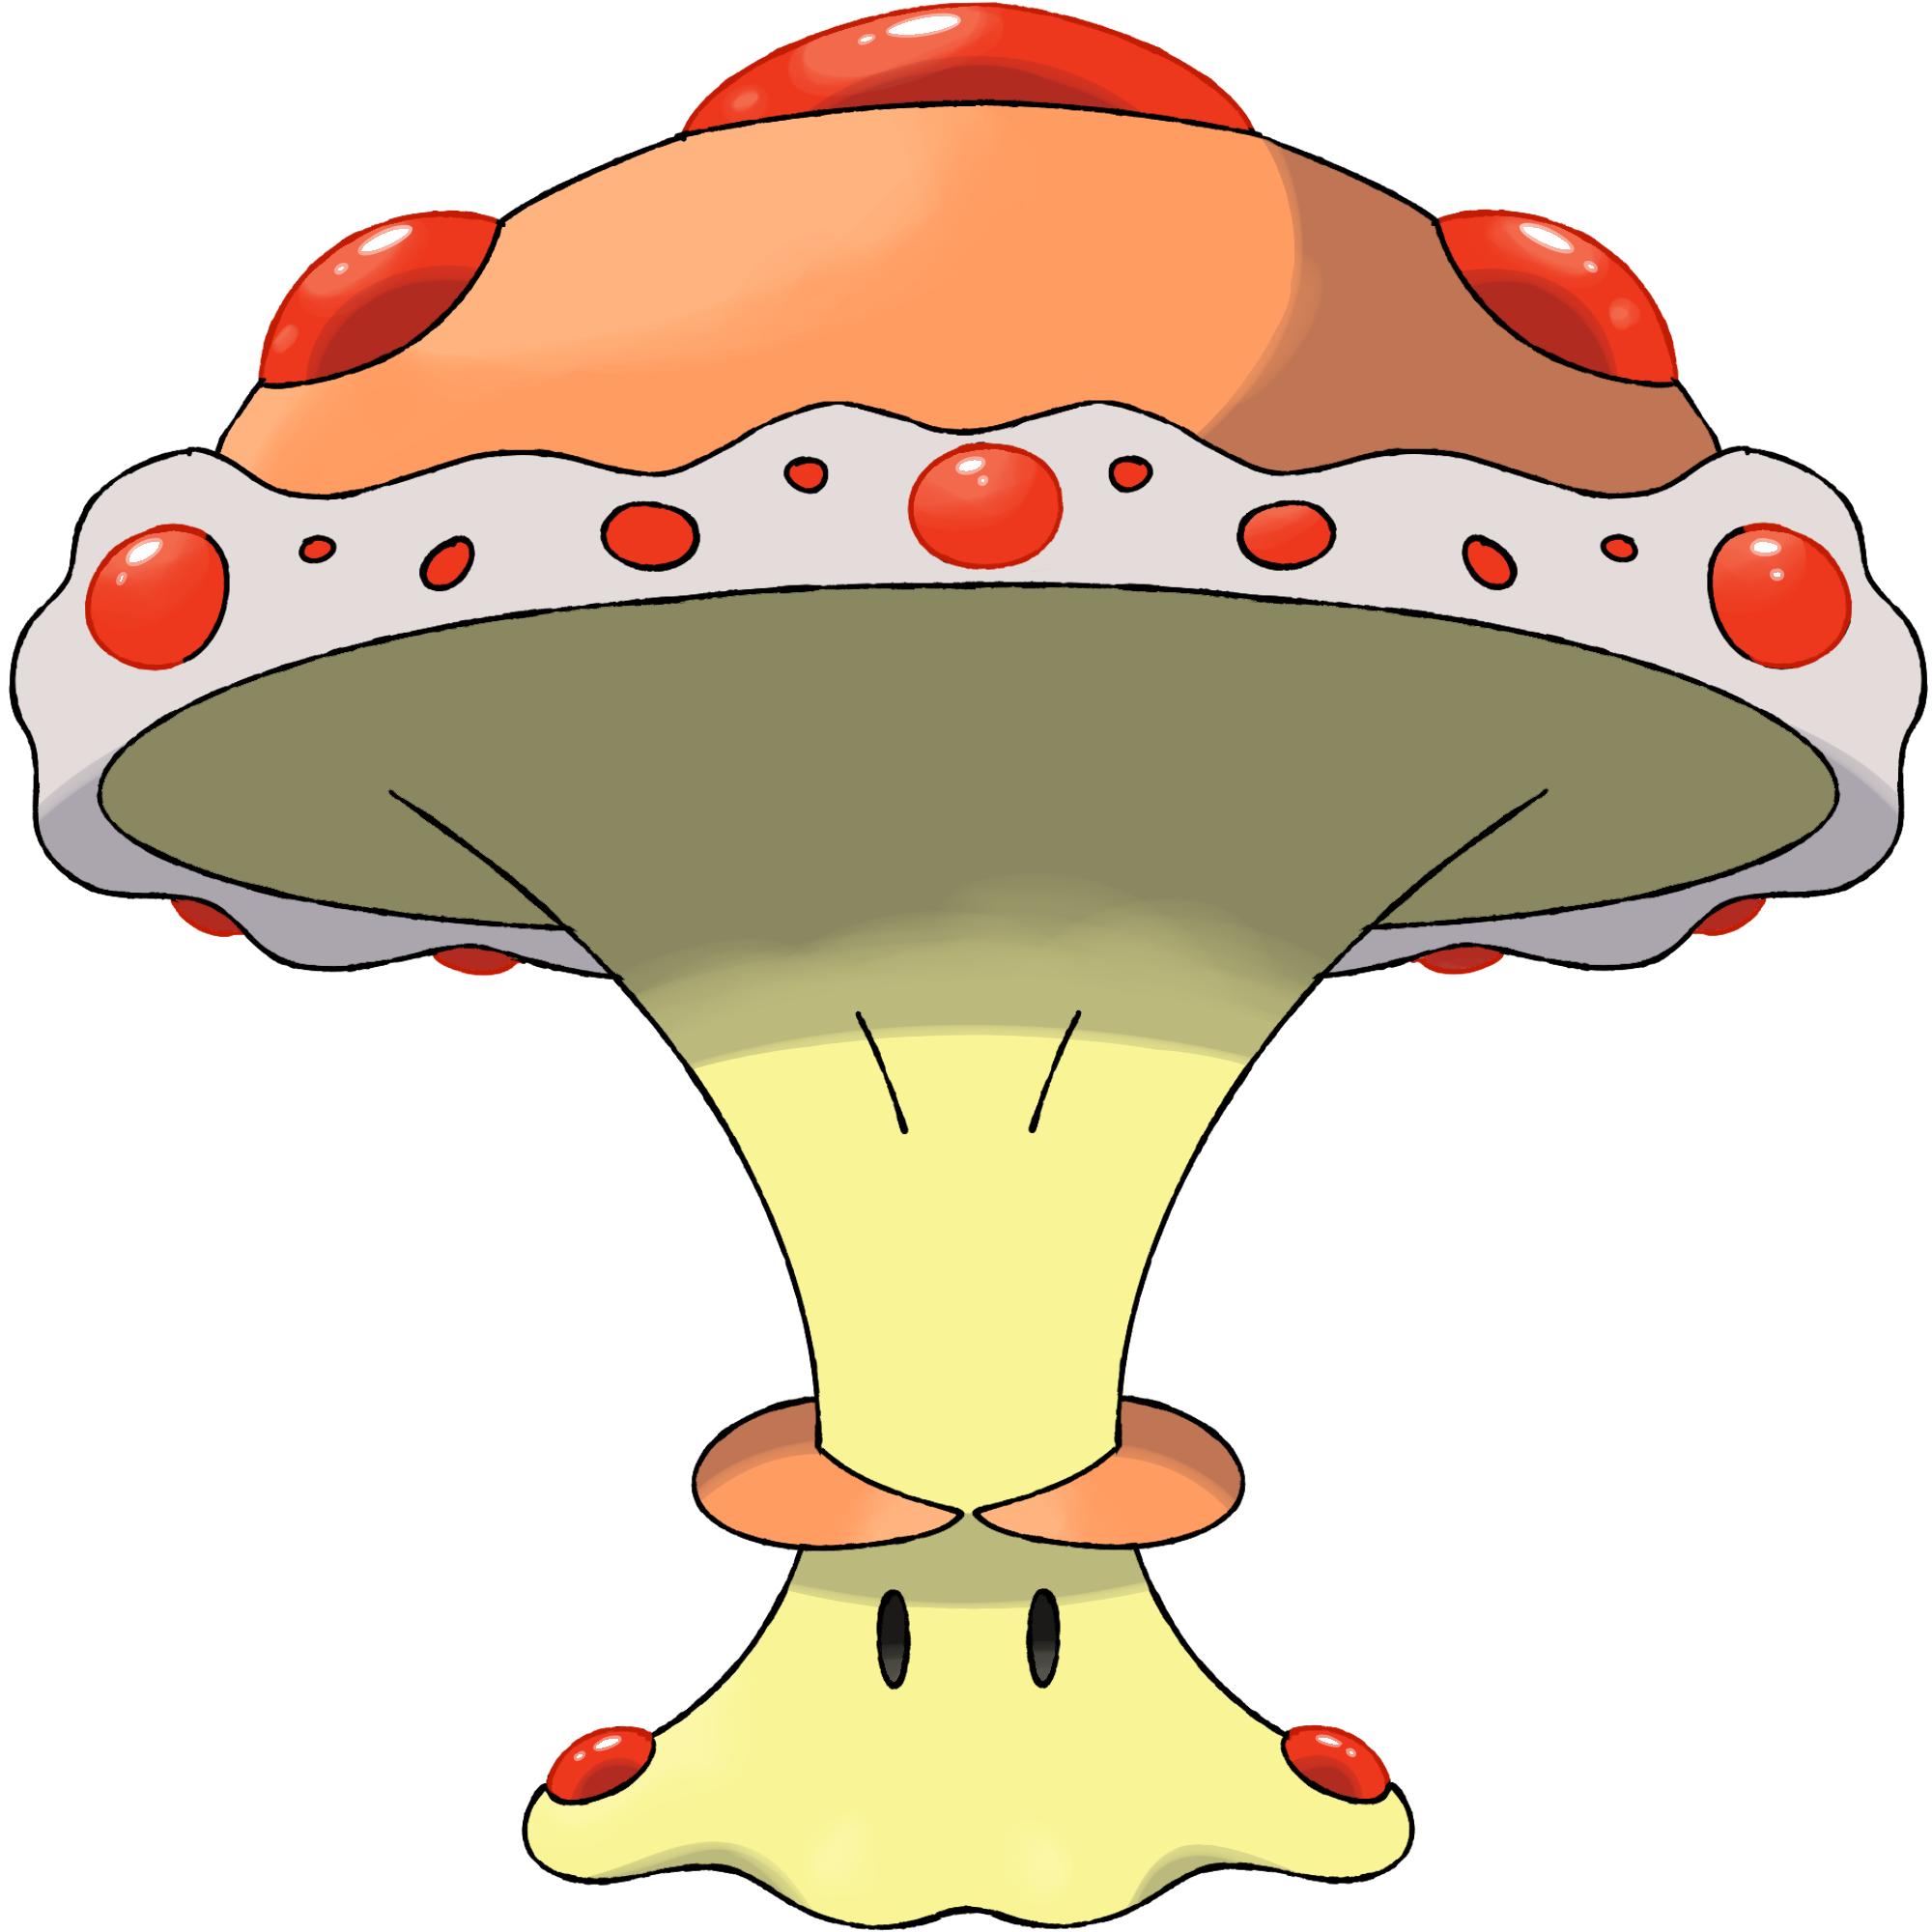 Mushroom clipart cloud. Pokemon concept caliboom oc